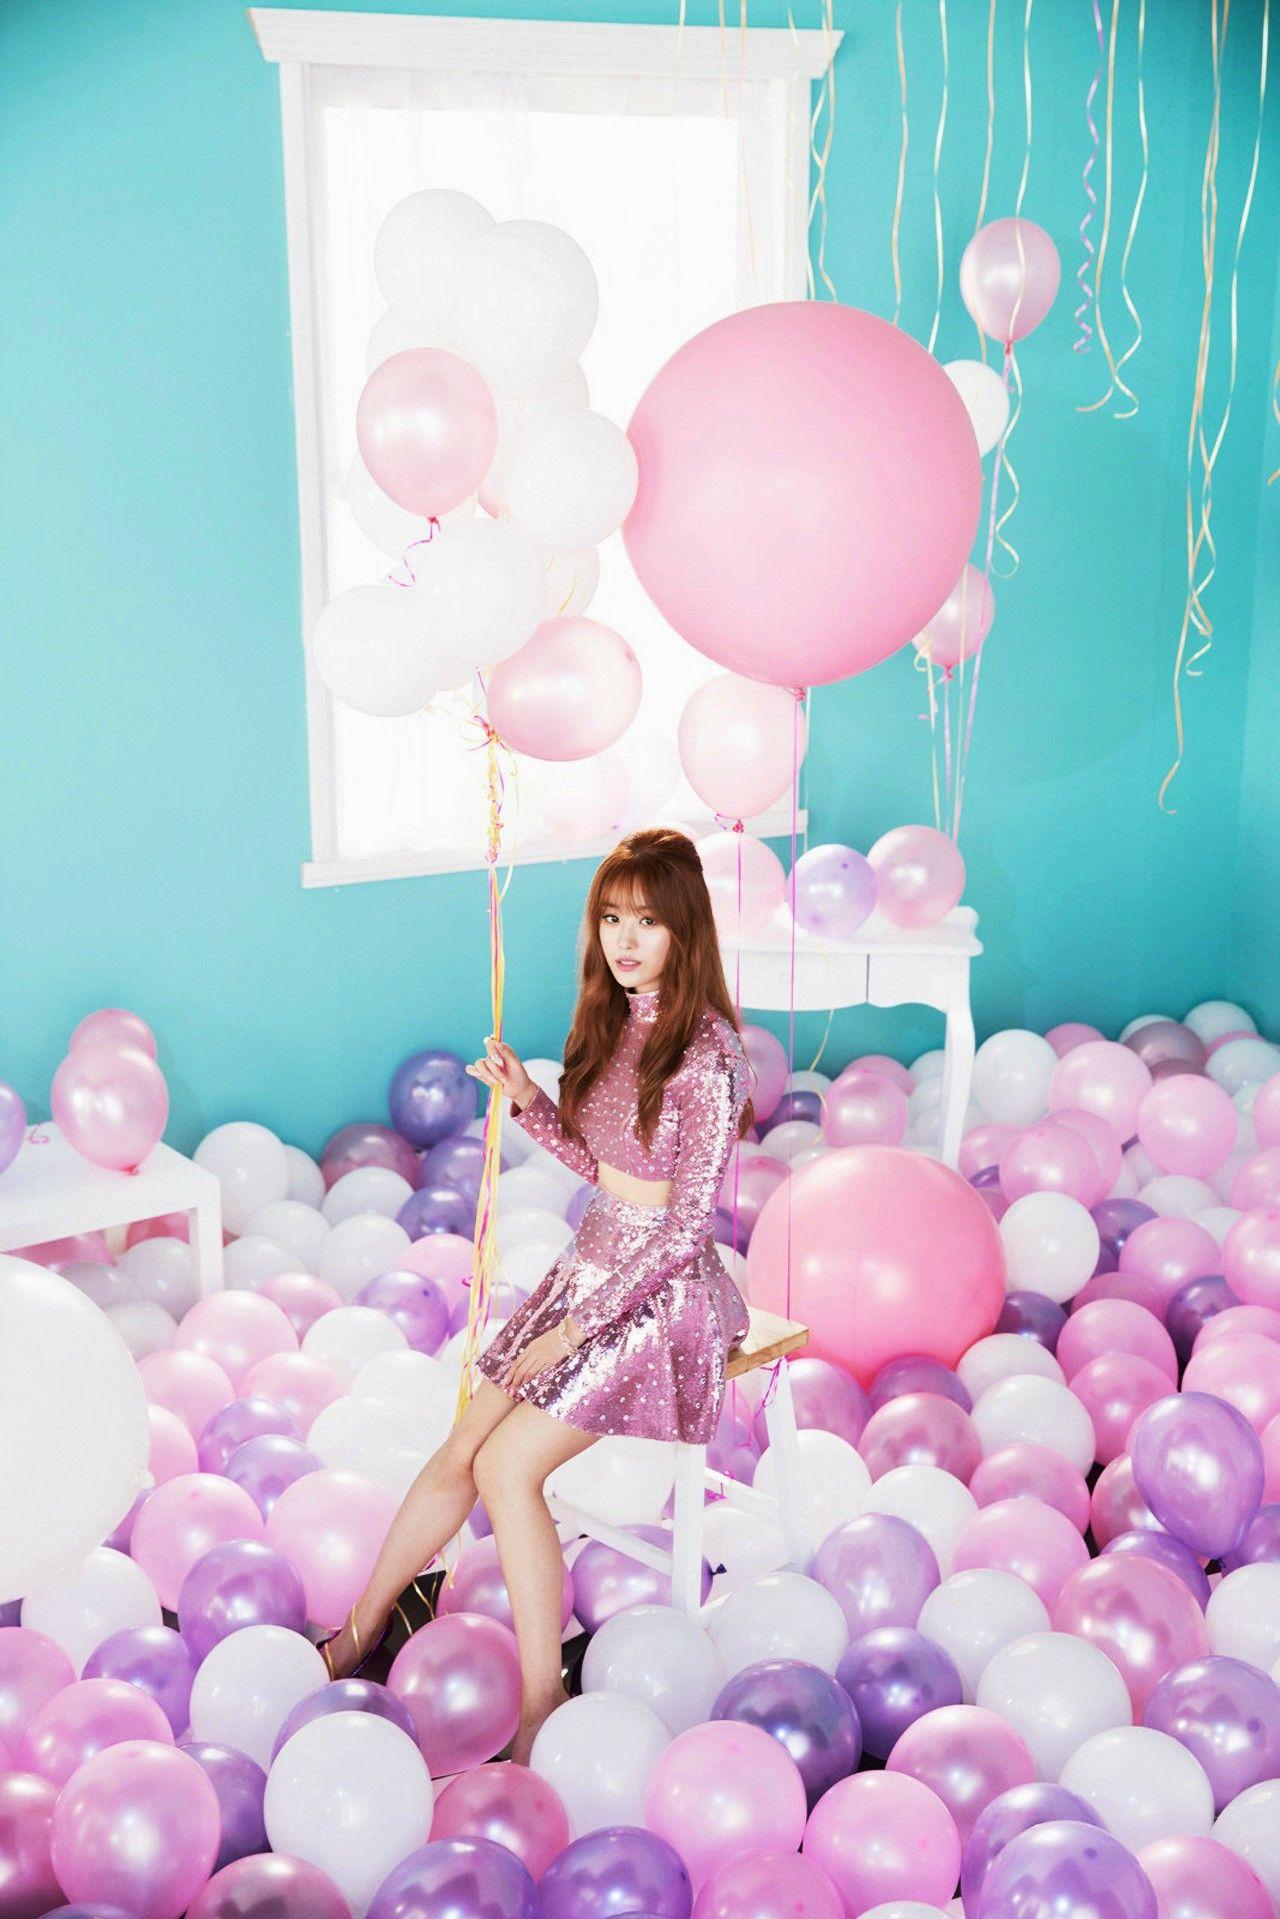 Secret Song JiEun 송지은 25 티저 이미지 (With images) Birthday